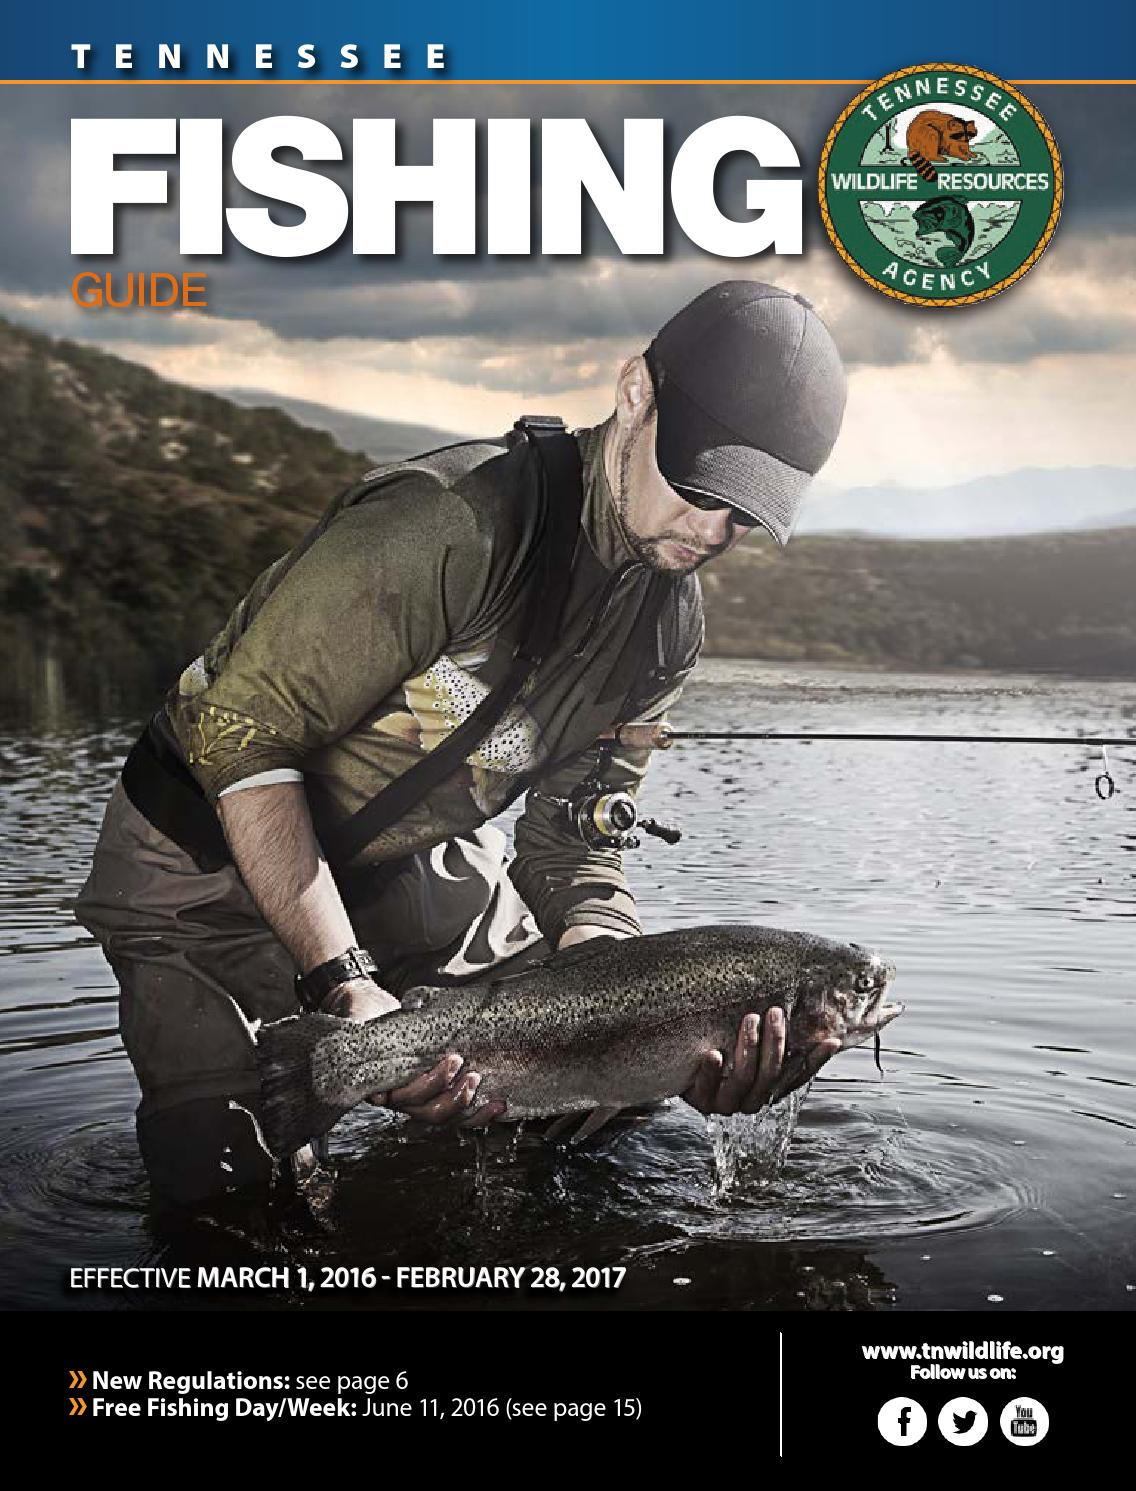 Tn fishing guide 2016 2017 by bingham group issuu for Tn fishing regulations 2017